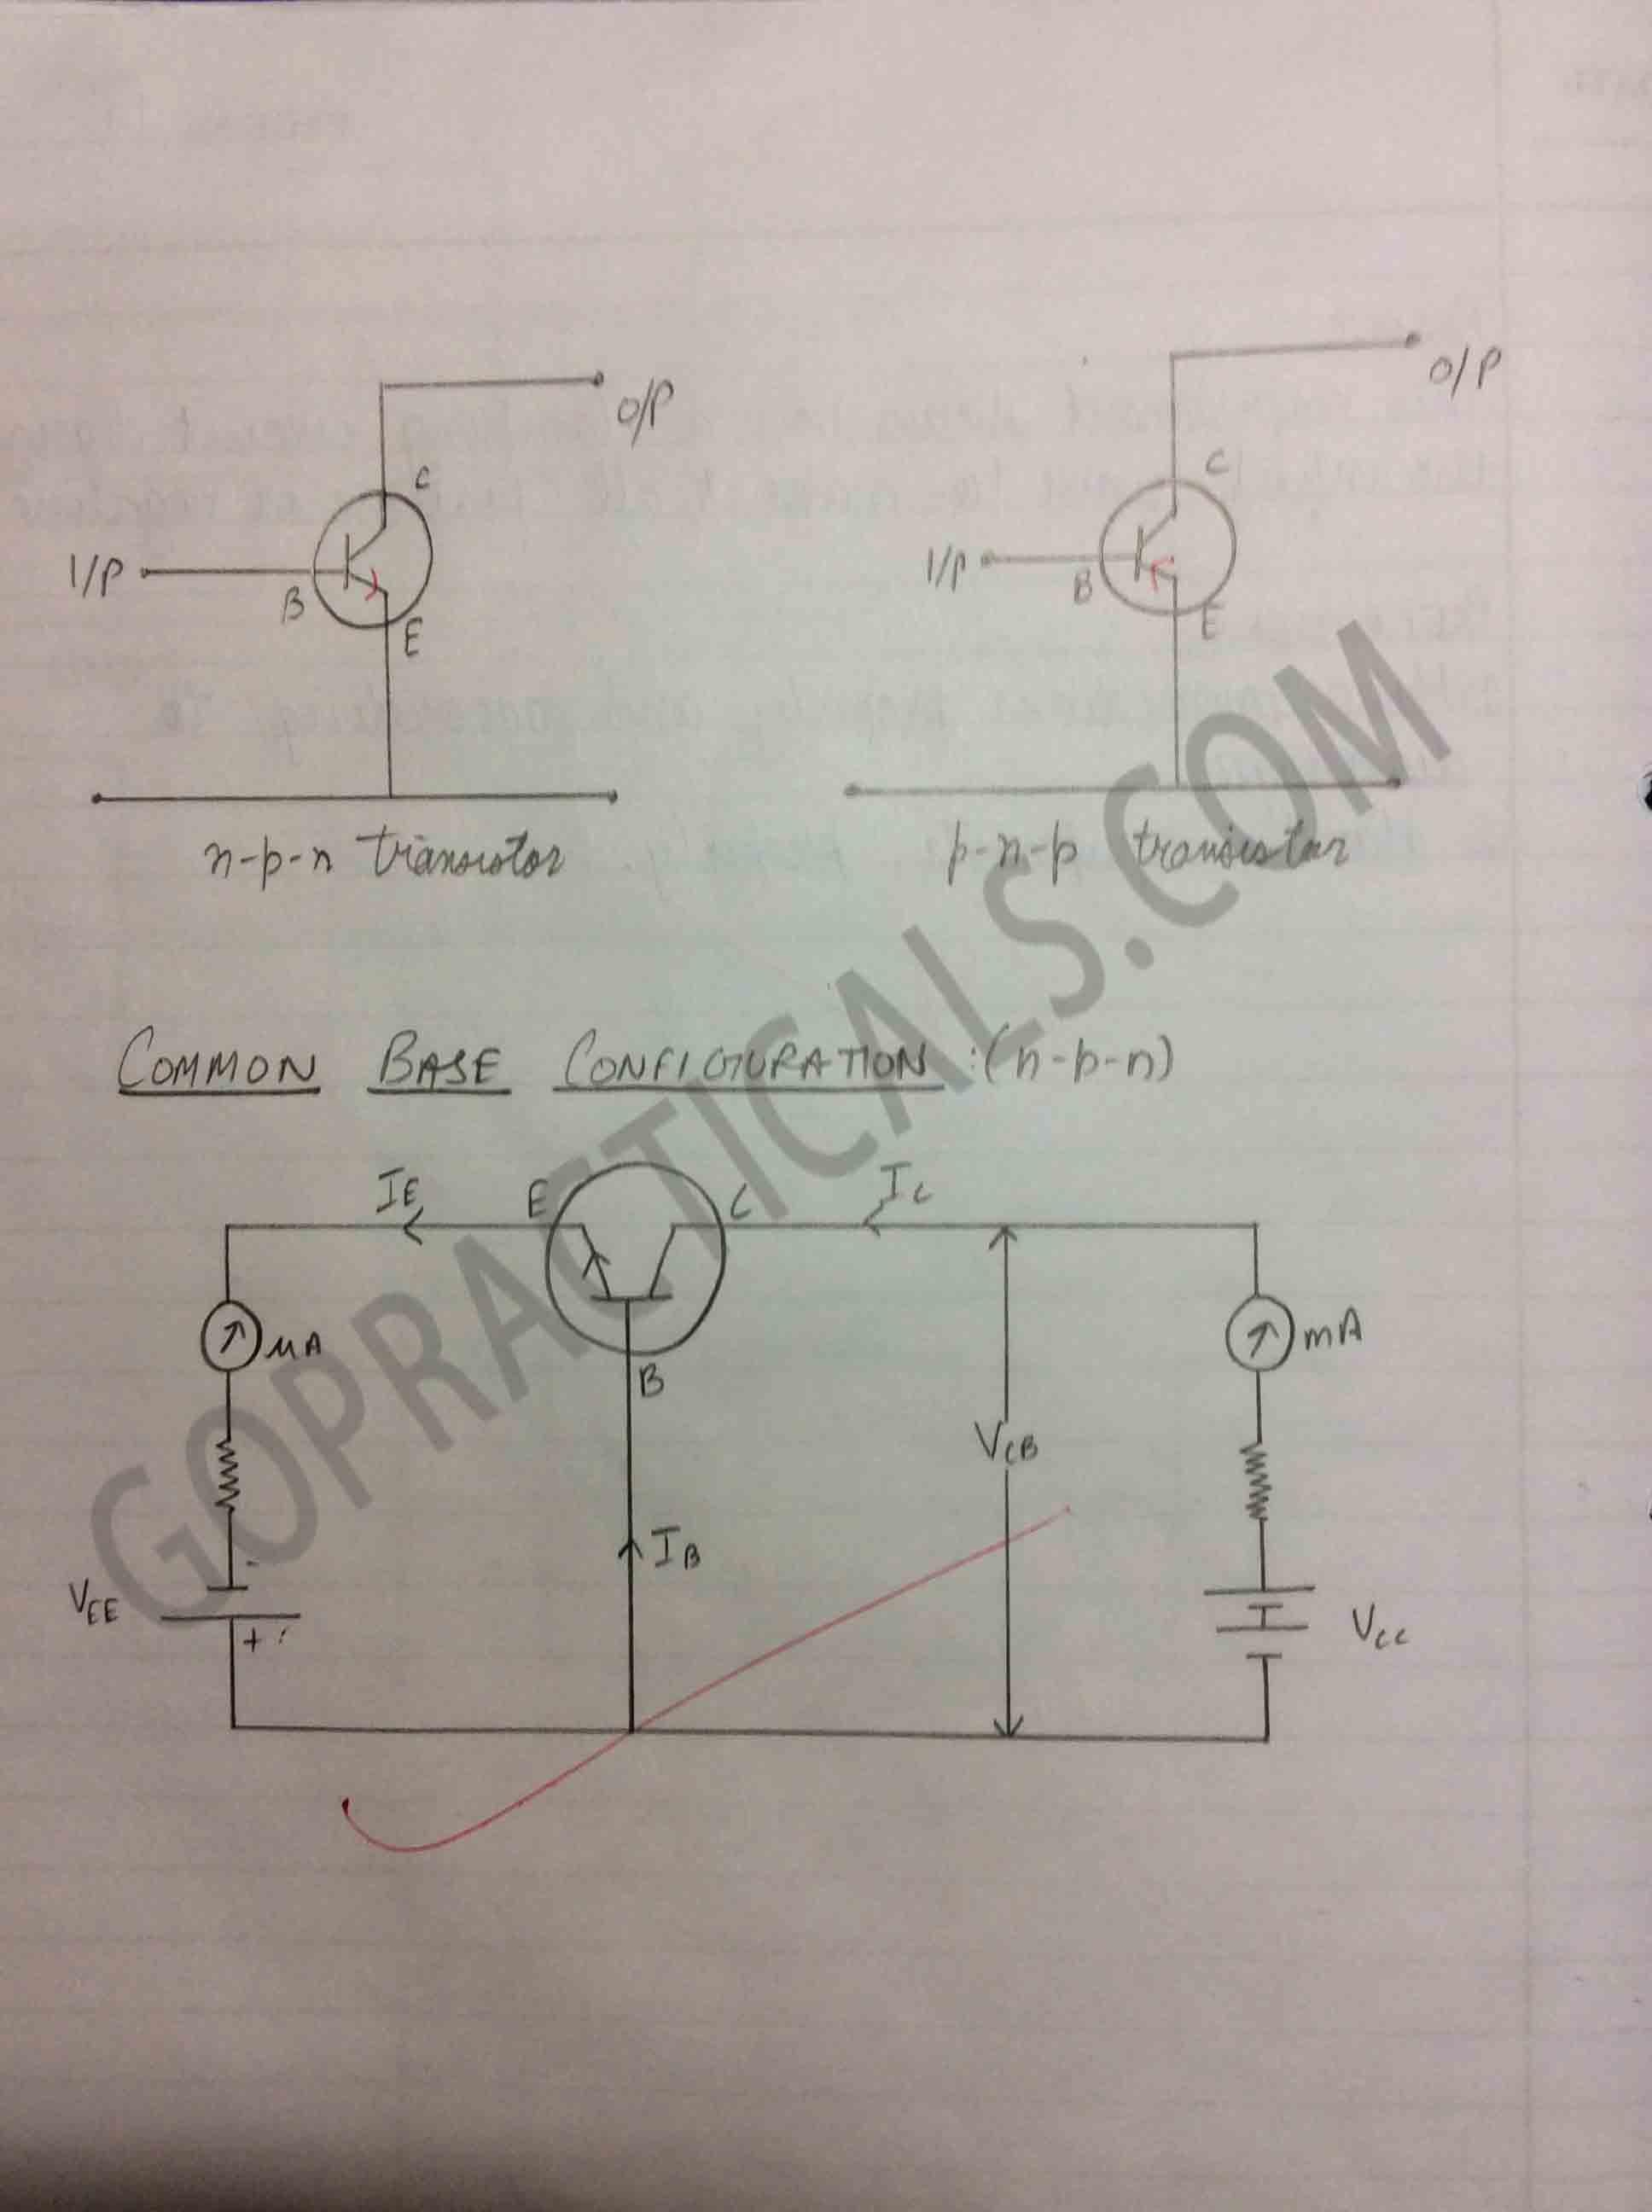 To study Transistor Input/Output Characteristics-2